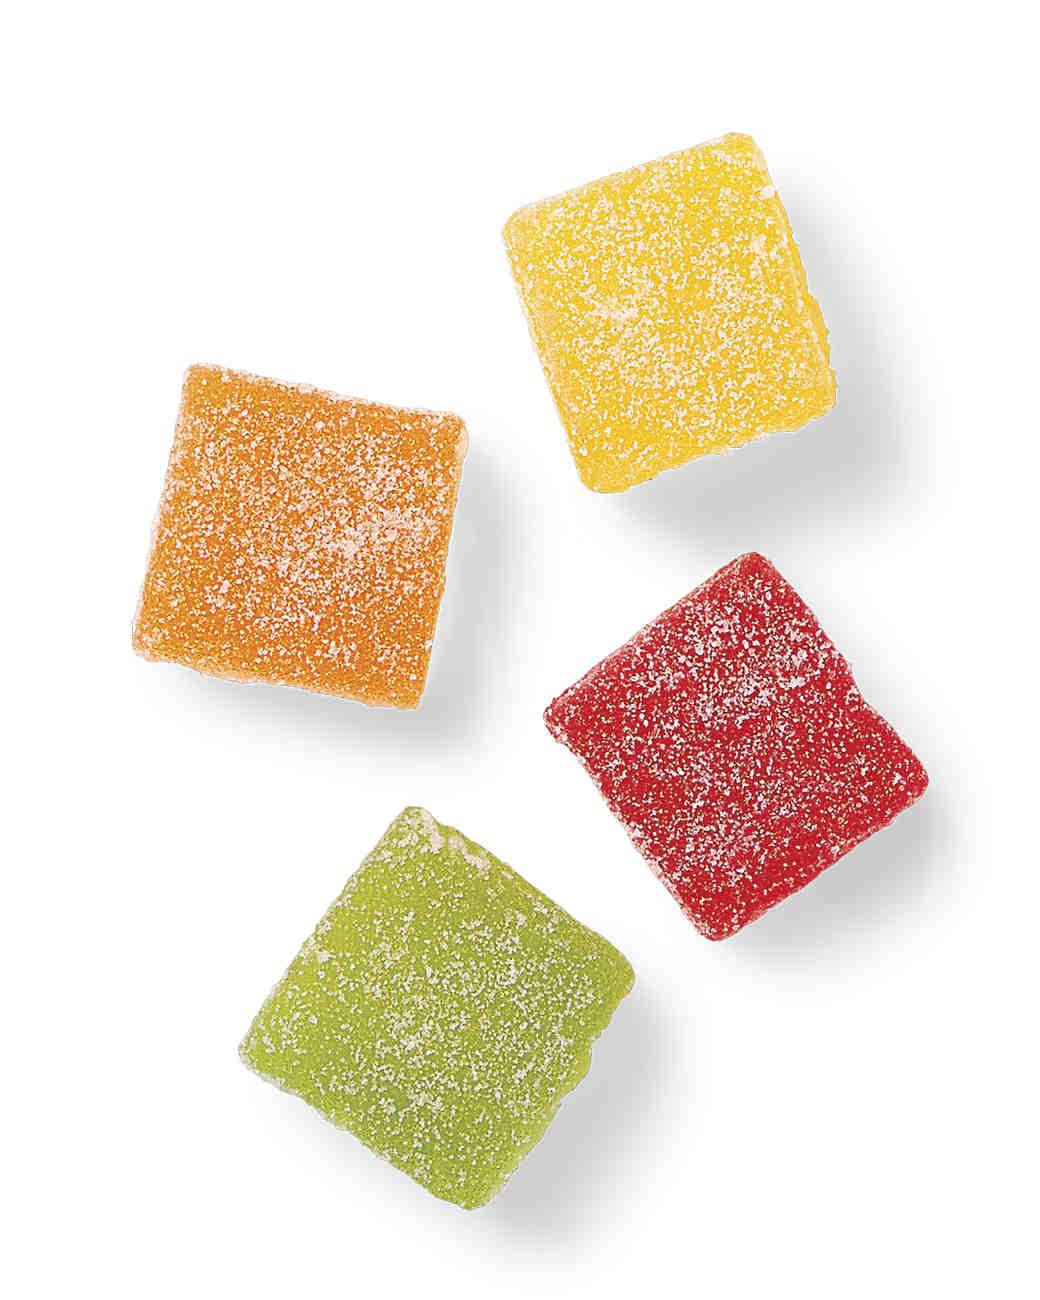 florida-fl-fruit-chews-099-d111965.jpg